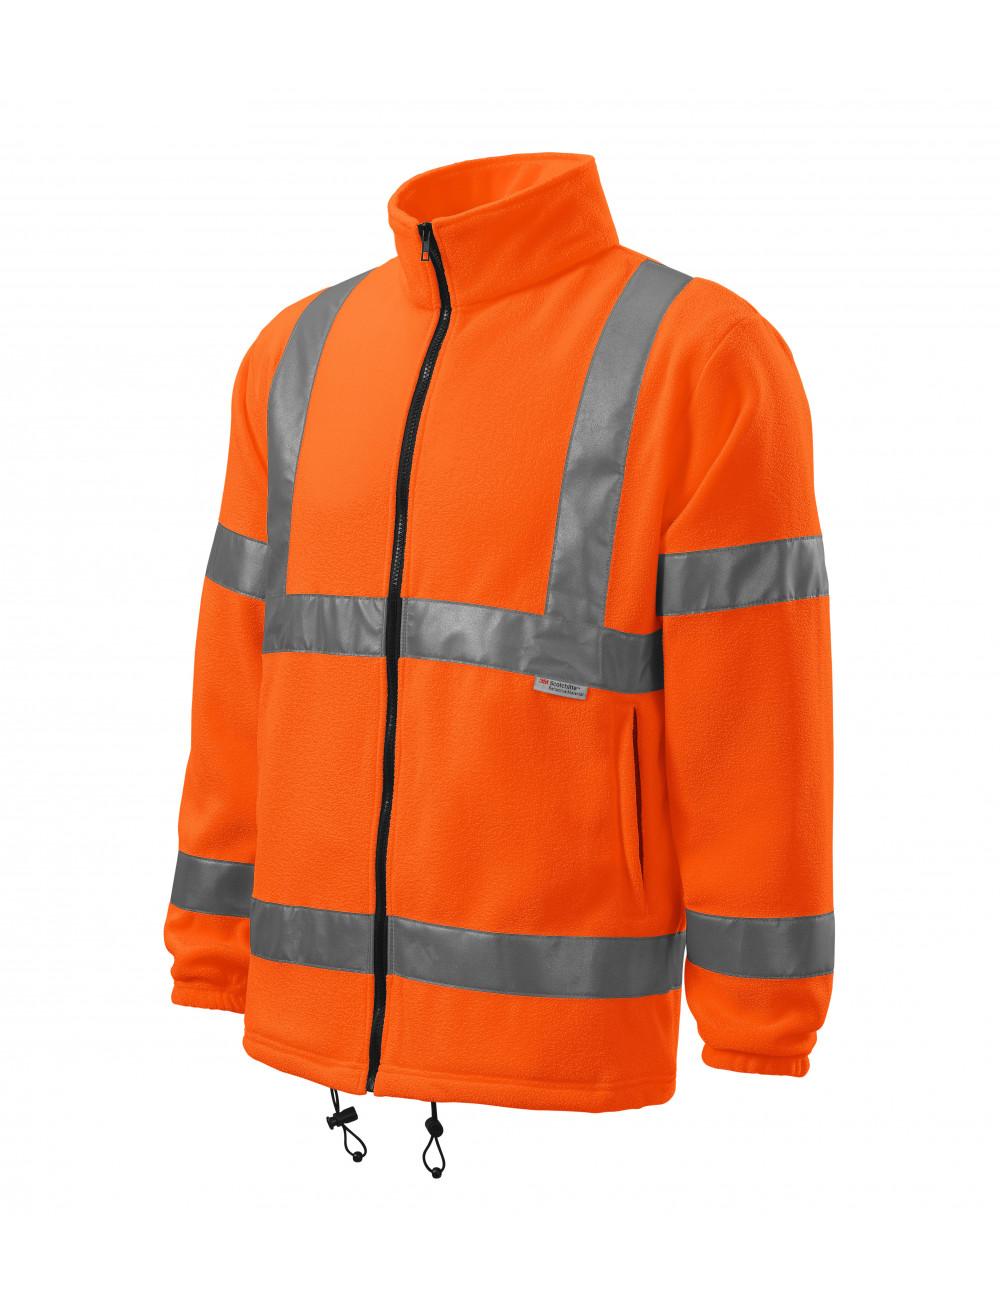 Adler RIMECK Polar unisex HV Fleece Jacket 5V1 odblaskowo pomarańczowy